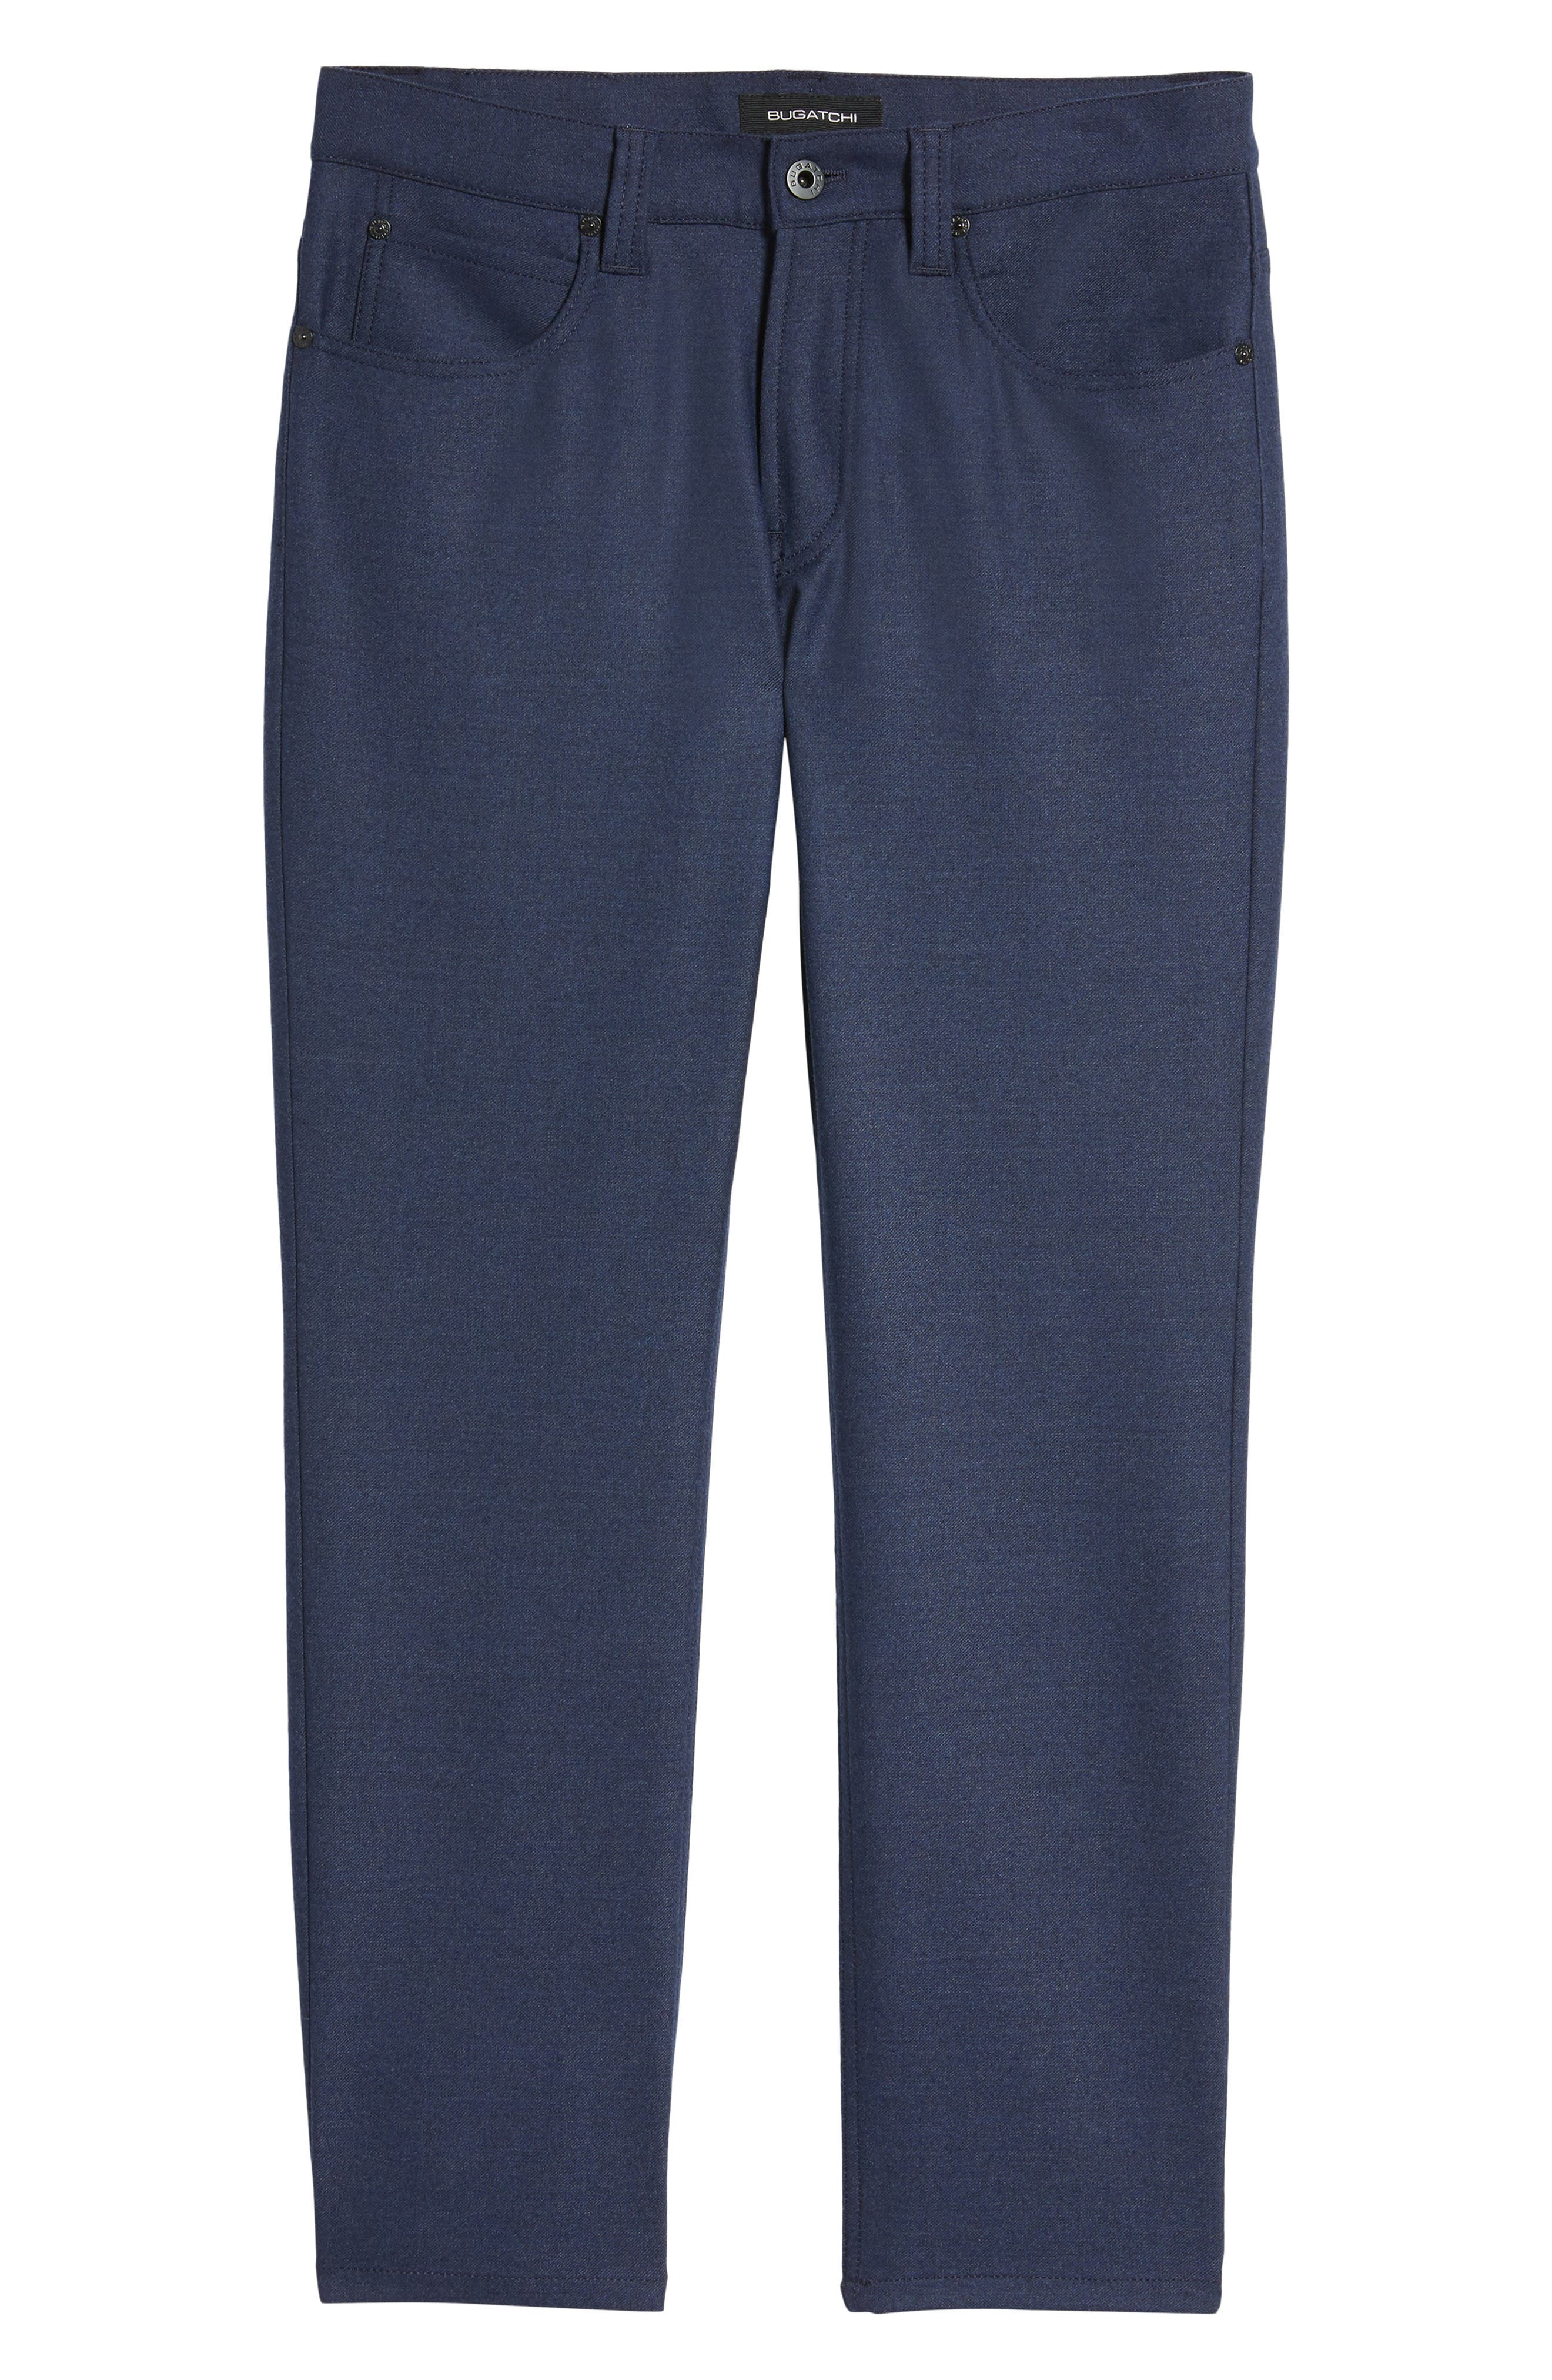 Wool Blend Pants,                             Alternate thumbnail 6, color,                             Navy